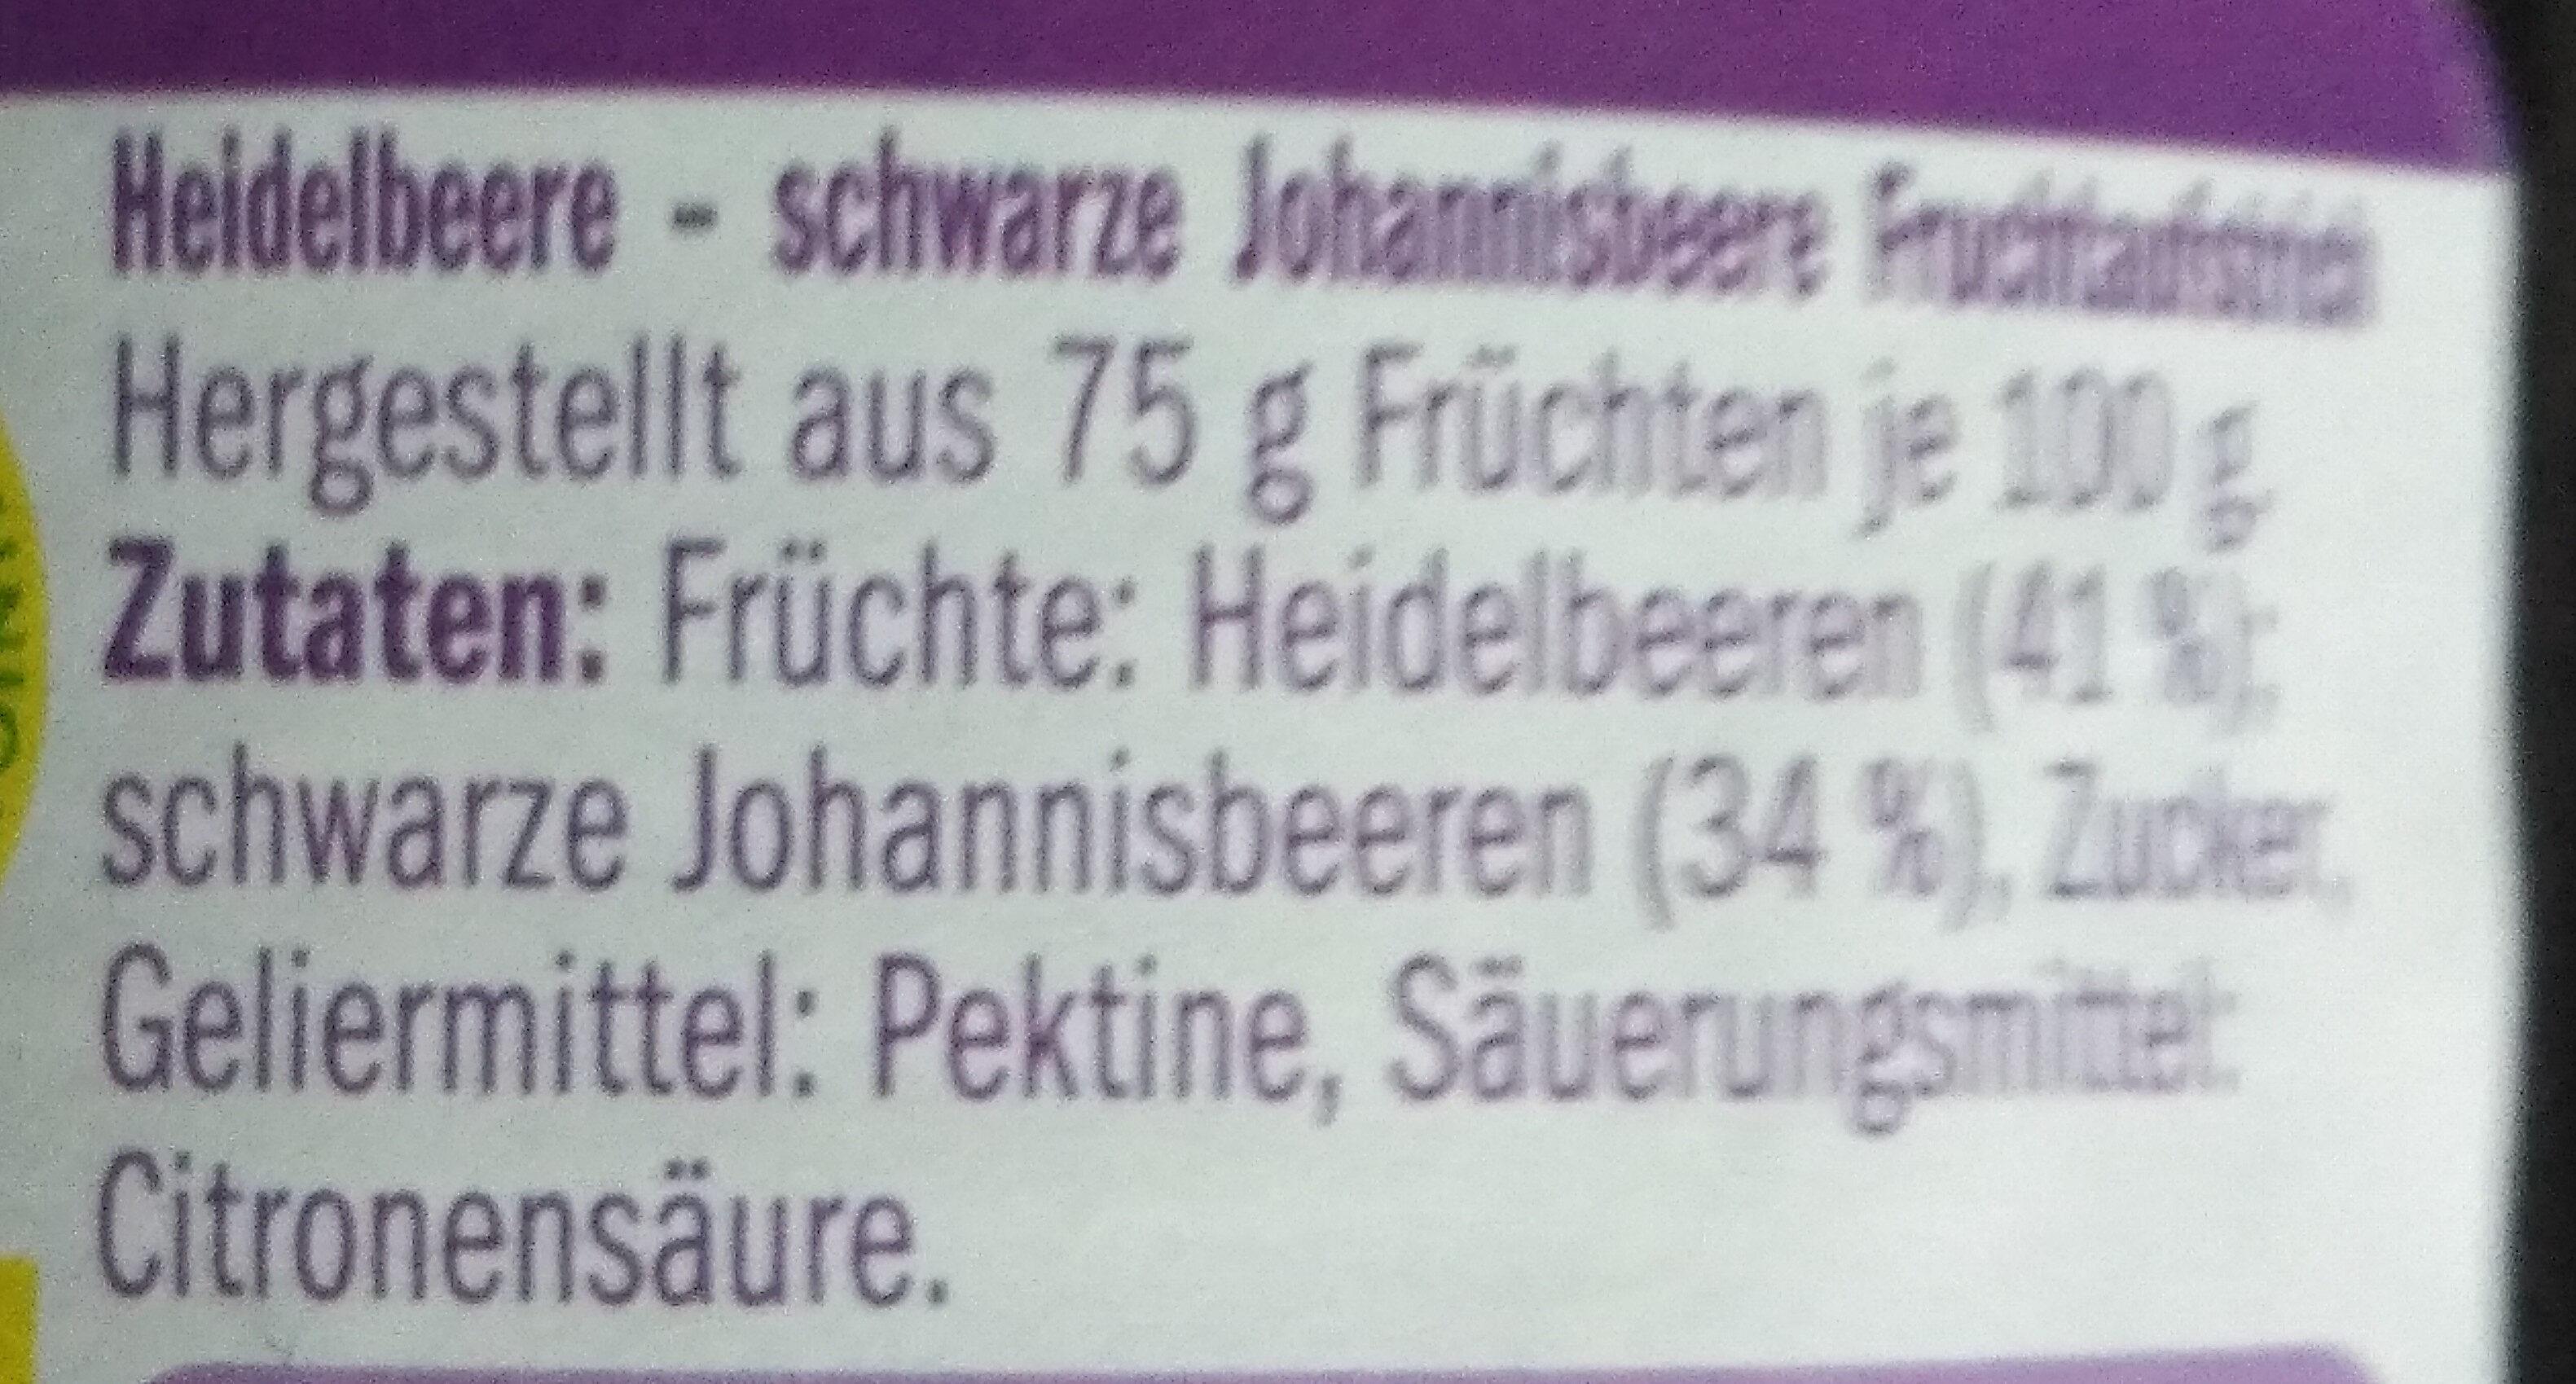 FRUCHTGENUSS  (75% Frucht ) Heidelbeere schwarze Johannisbeere - Ingredients